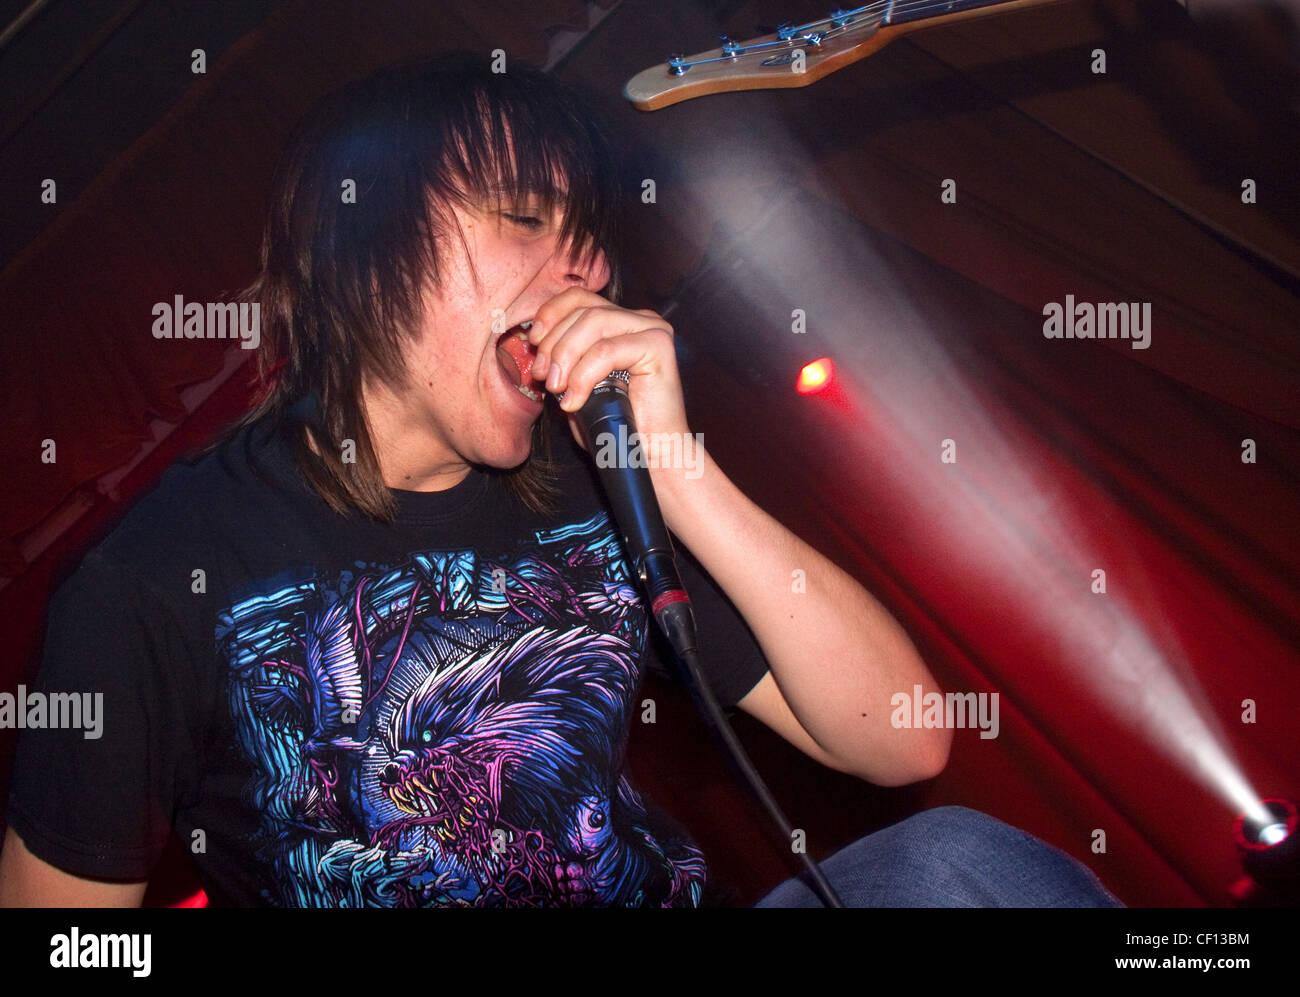 Laden Sie dieses Alamy Stockfoto Matty Awbery AQOE, Winnington 26.03.2010 - CF13BM